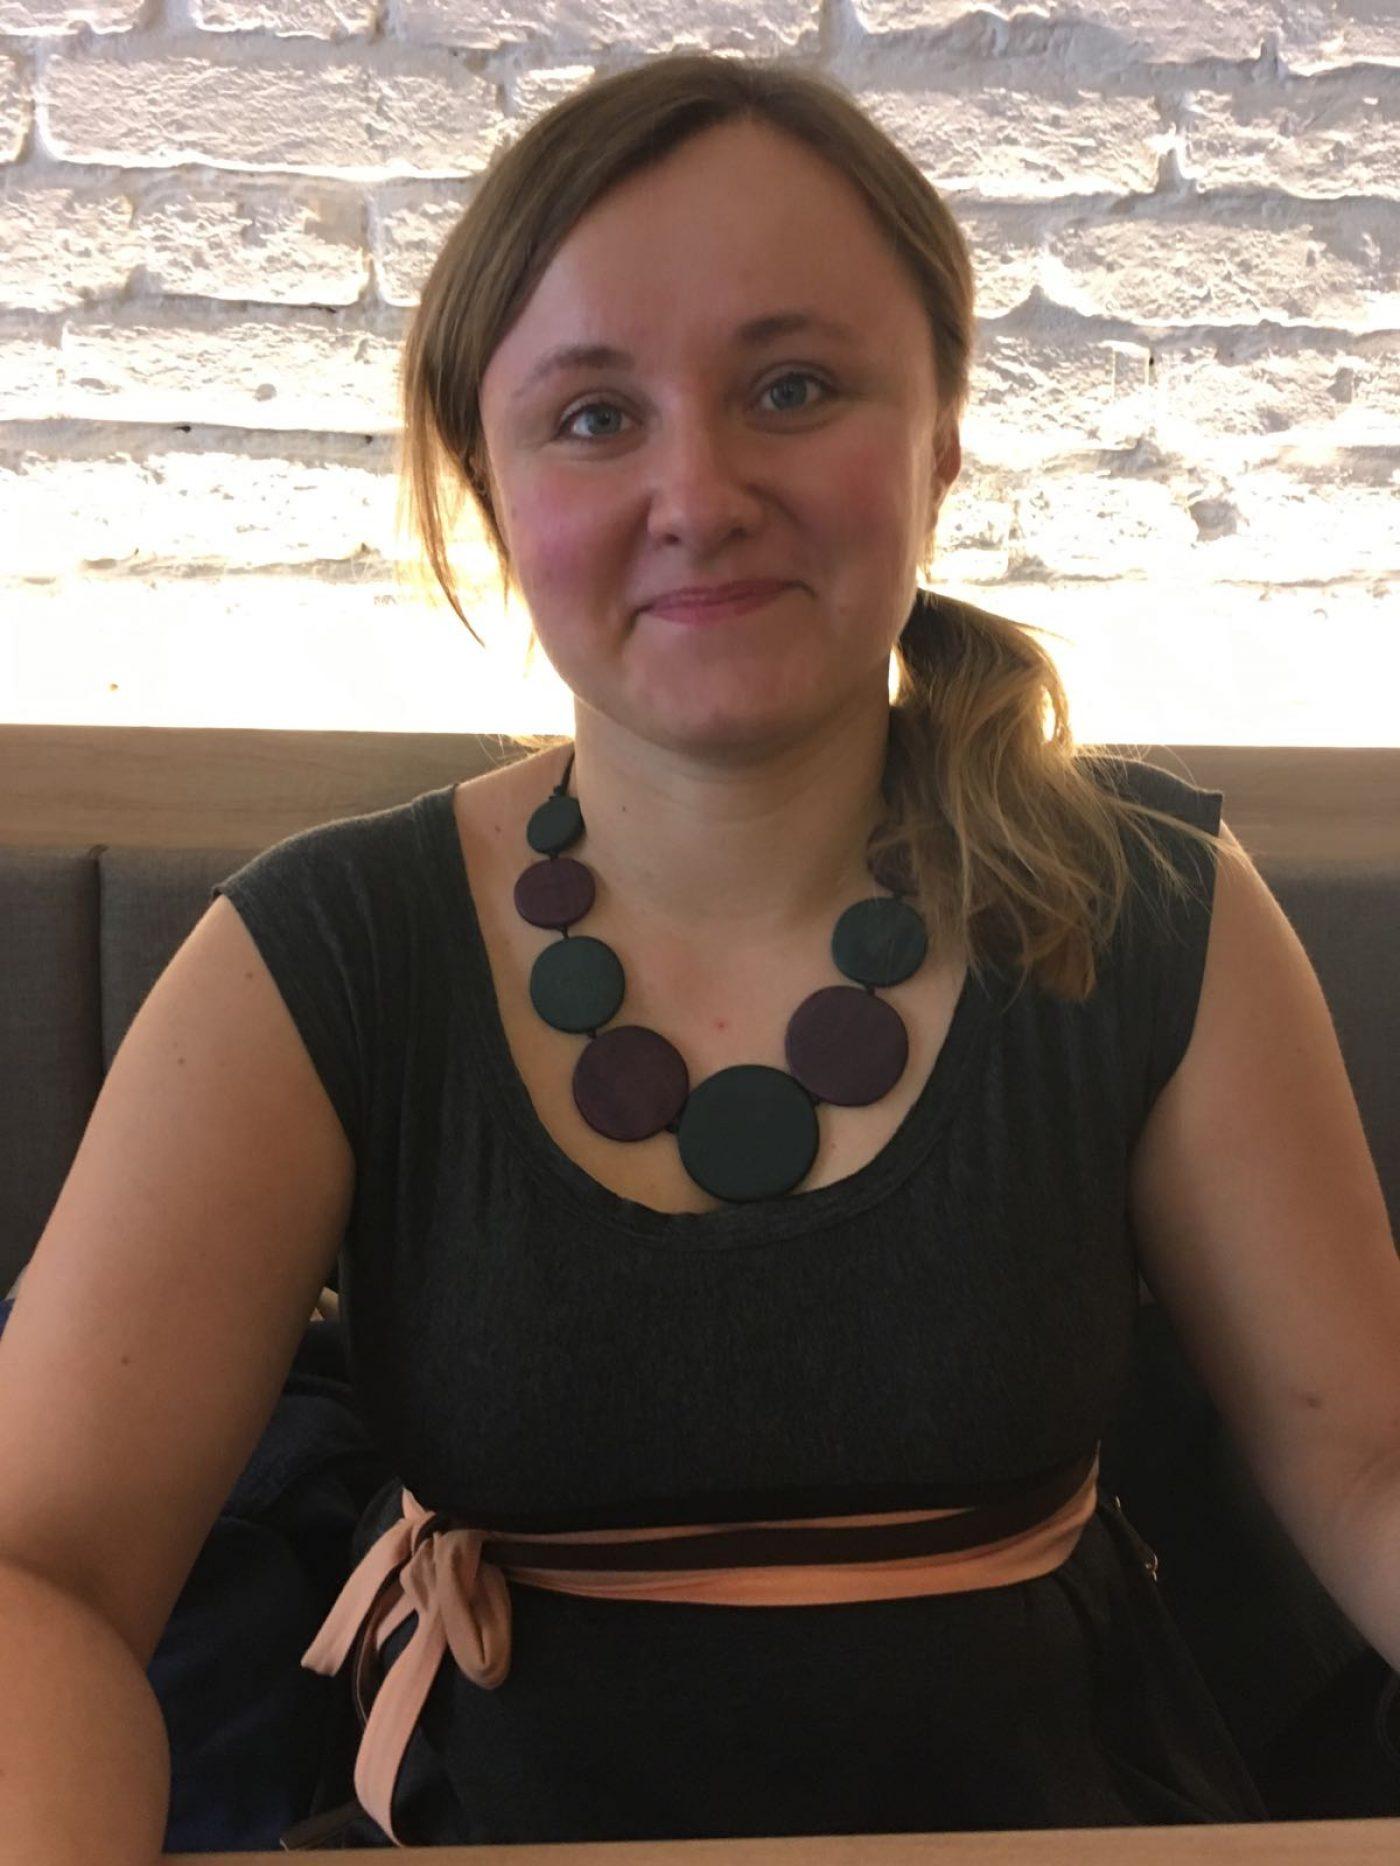 {:de}Magdalena Tomczyk, Molekularbiologin{:}{:en}Magdalena Tomczyk, molecular biologist{:}{:bg}Магдалена Томчик, техник местопрестъпление{:}{:sl}Magdalena Tomczyk, diplomirana molekularna biologinja{:}